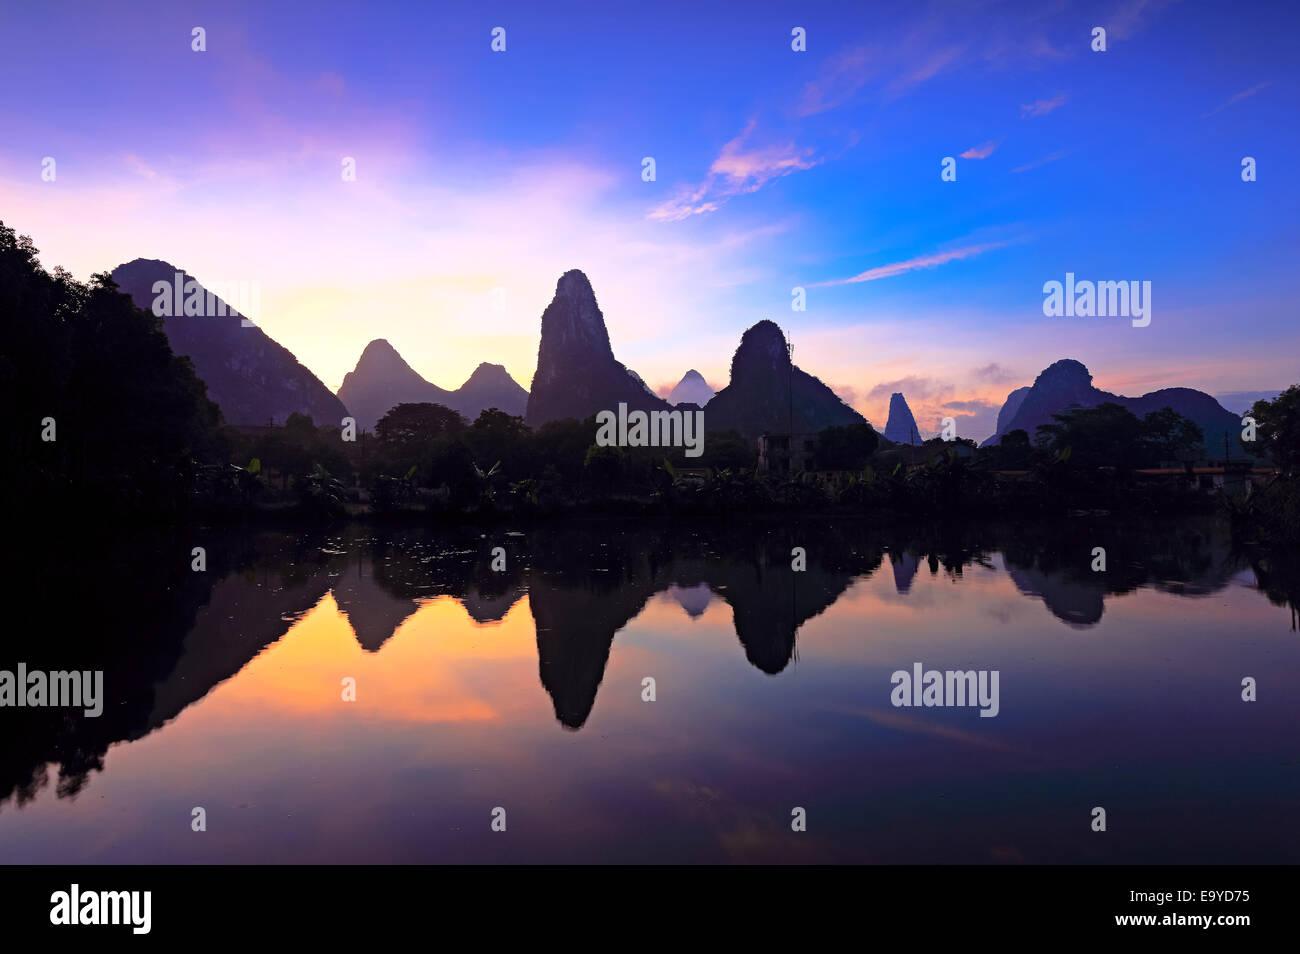 Paesaggi di Guilin Immagini Stock